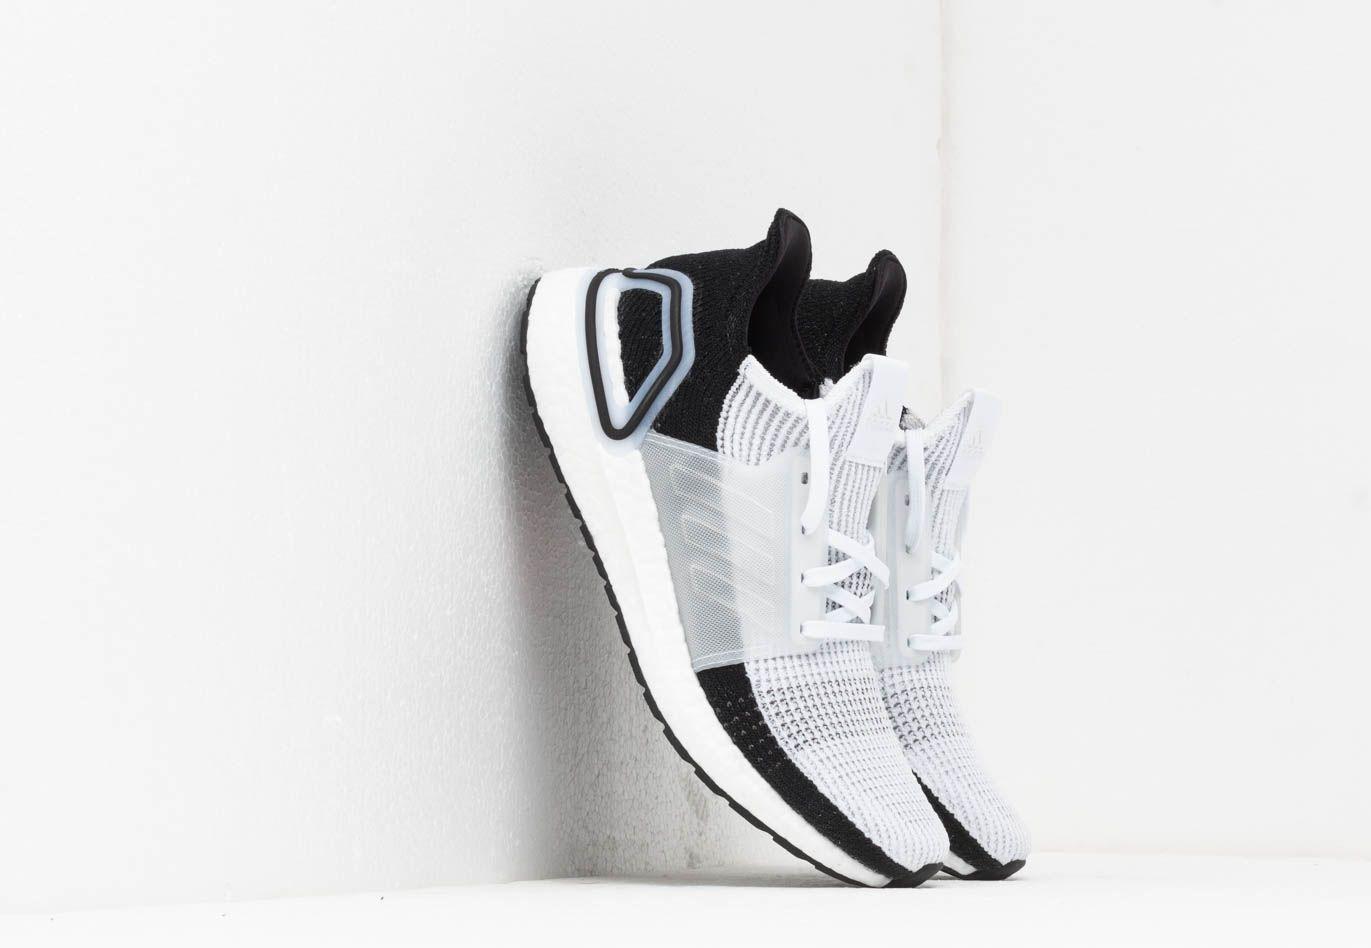 06e033b73 Adidas Originals - Adidas Ultraboost 19 Ftwr White  Ftwr White  Grey Two  for Men. View fullscreen